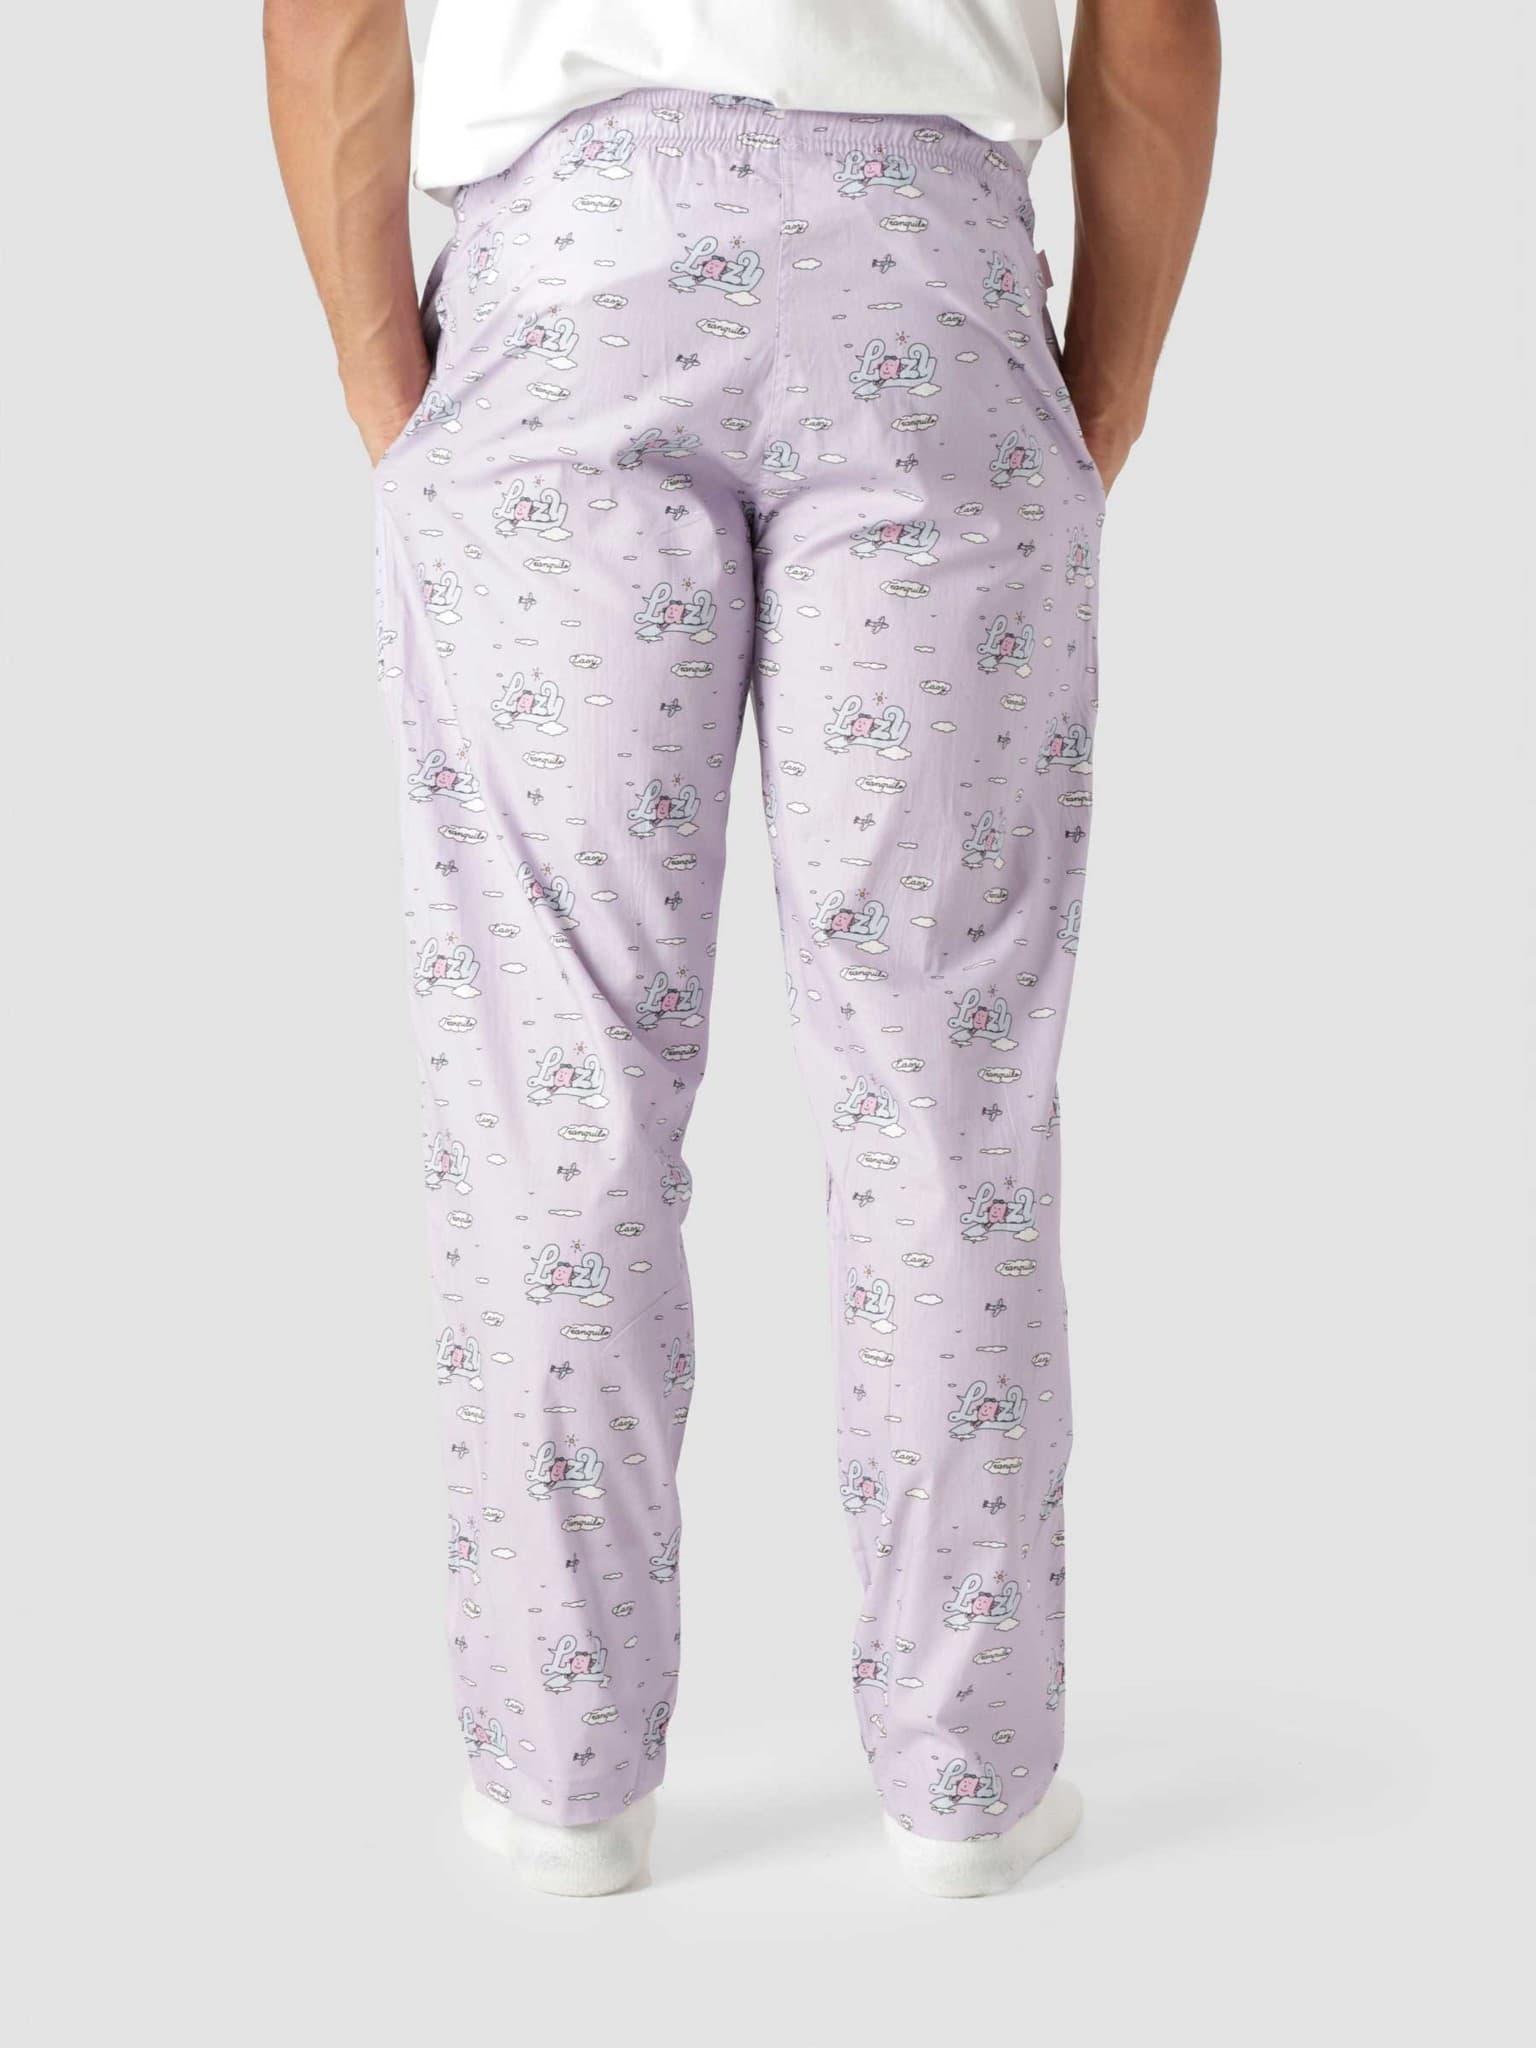 x Pockies Lazy Pyjama Pants Lavendel P100